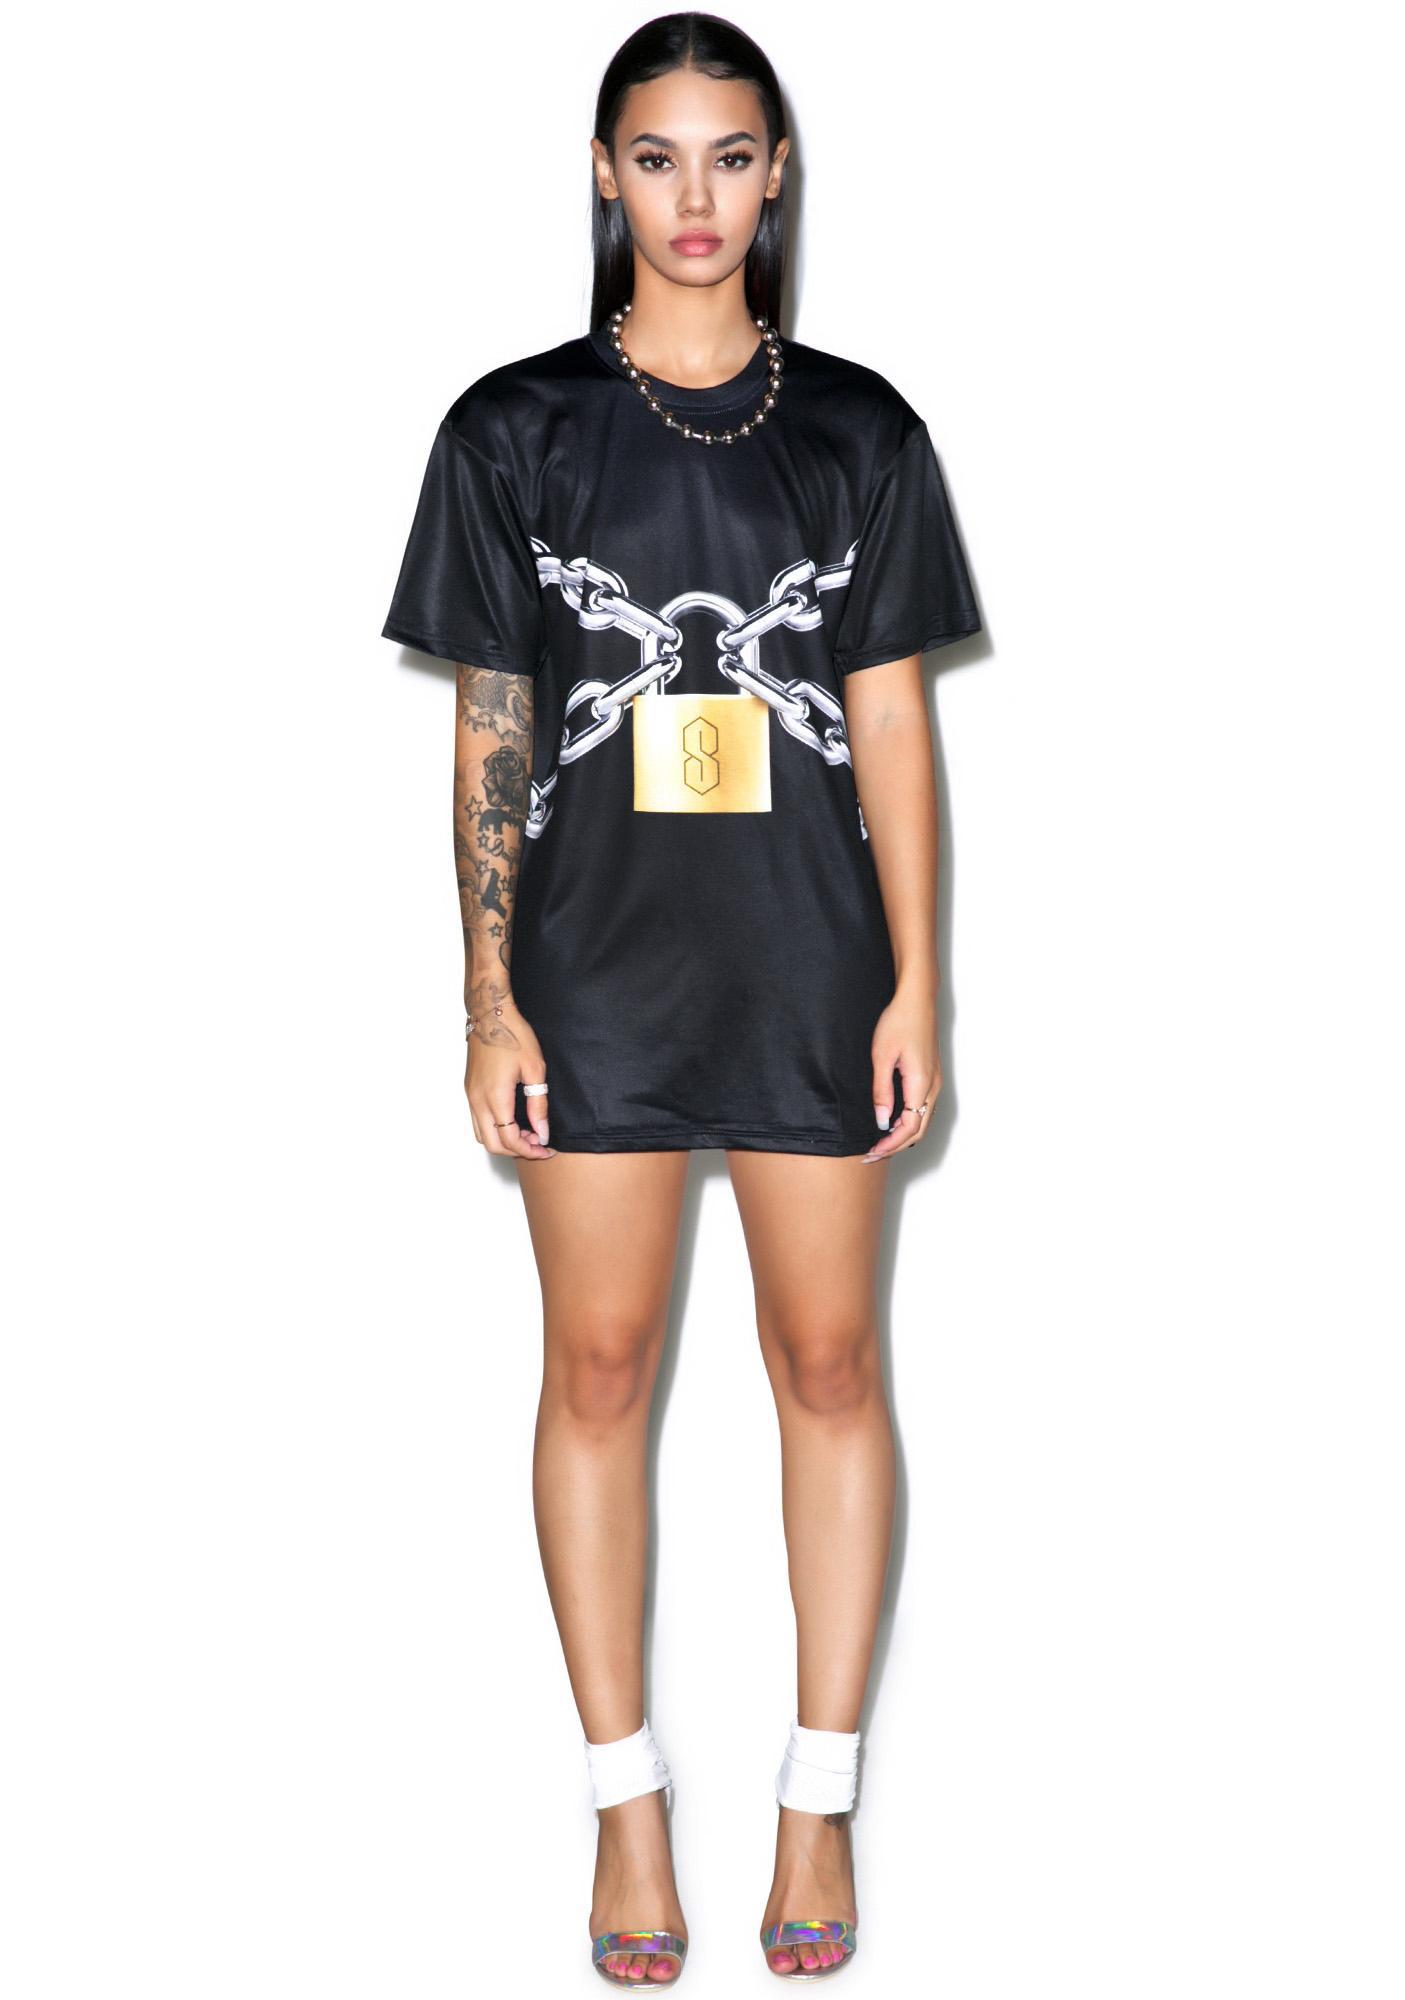 SOWET Locked Up T-Shirt